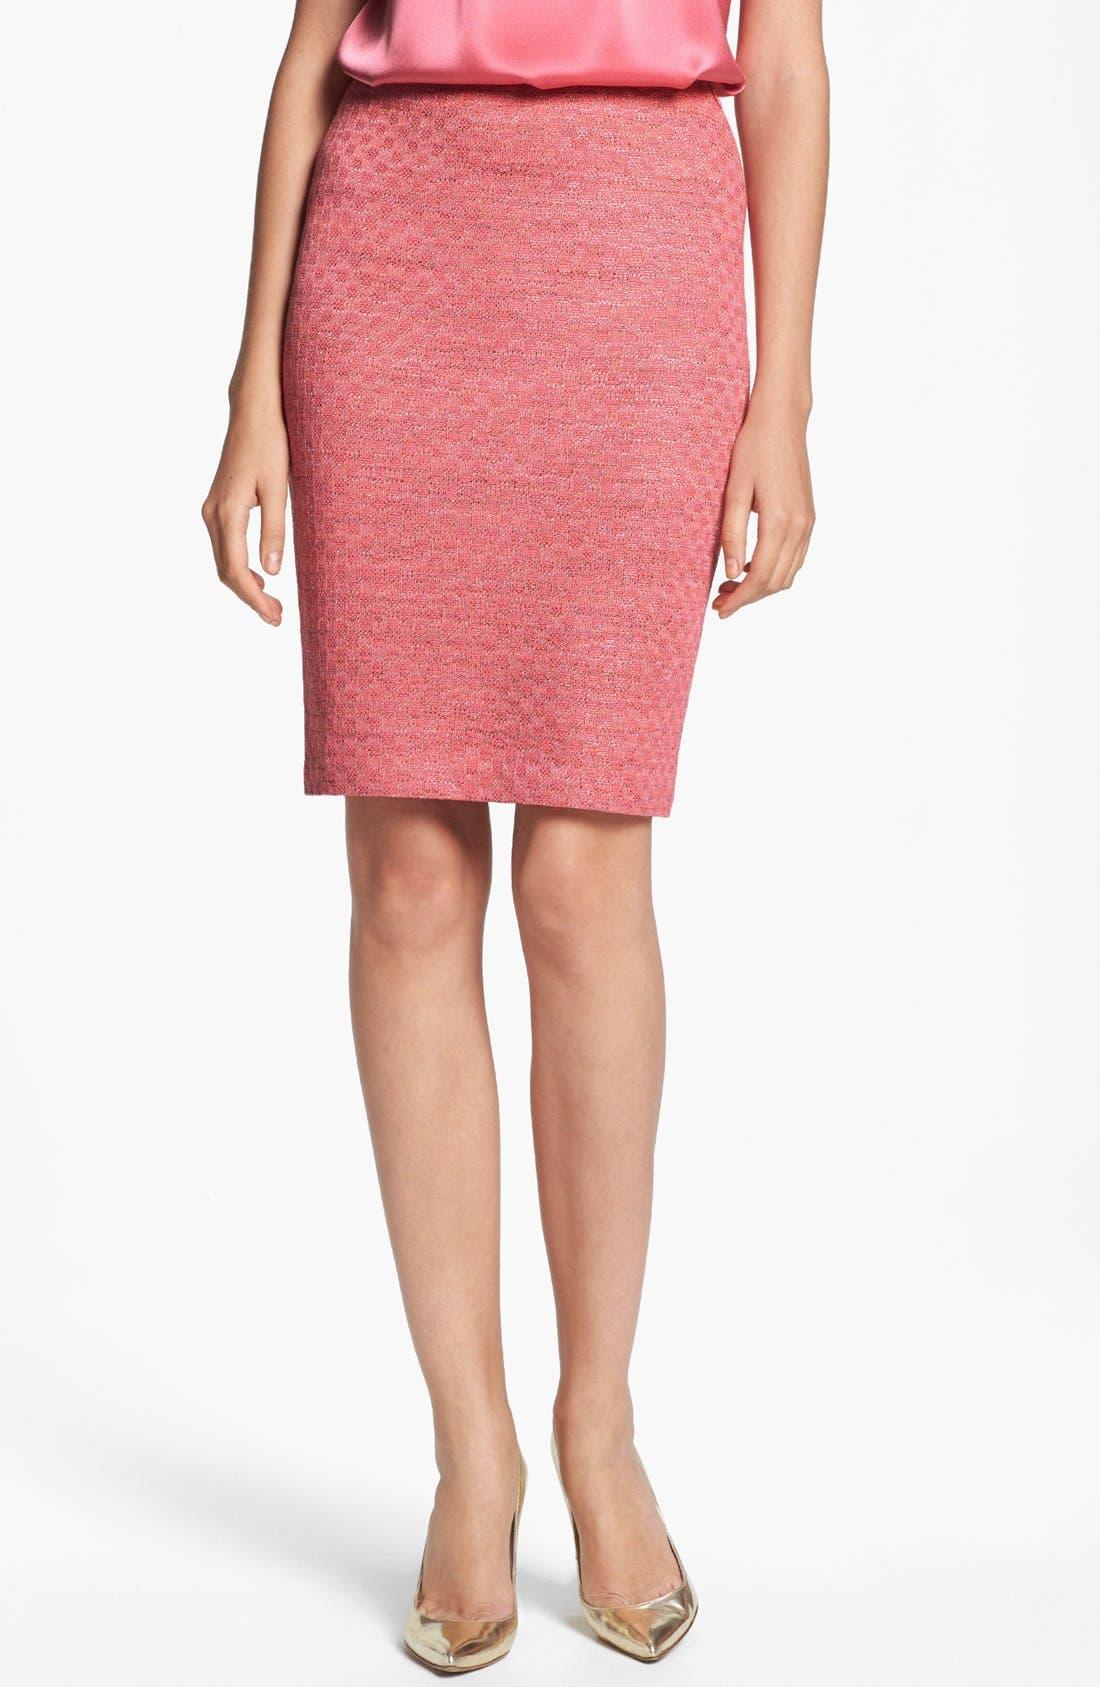 ST. JOHN COLLECTION, Damier Knit Pencil Skirt, Main thumbnail 1, color, 950